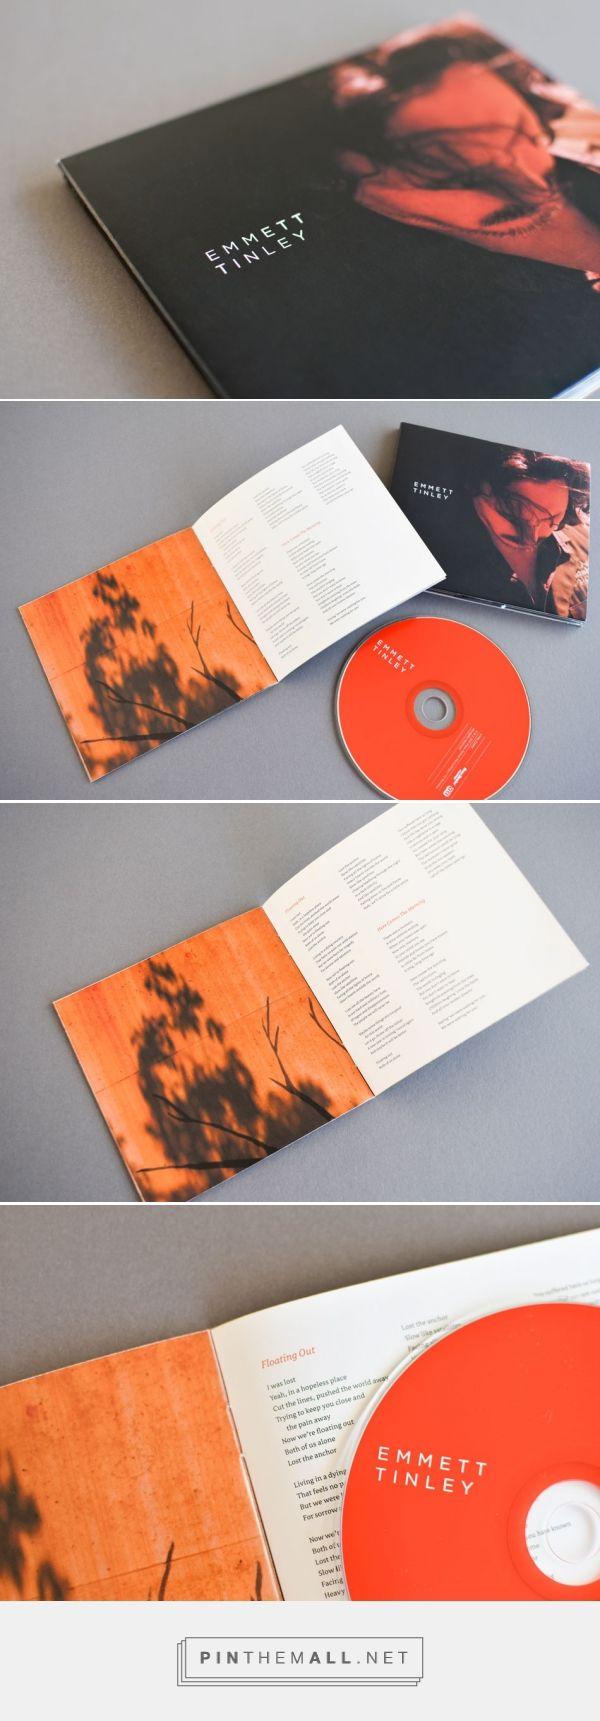 Emmett Tinley Album - Yuki Bang - created via https://pinthemall.net